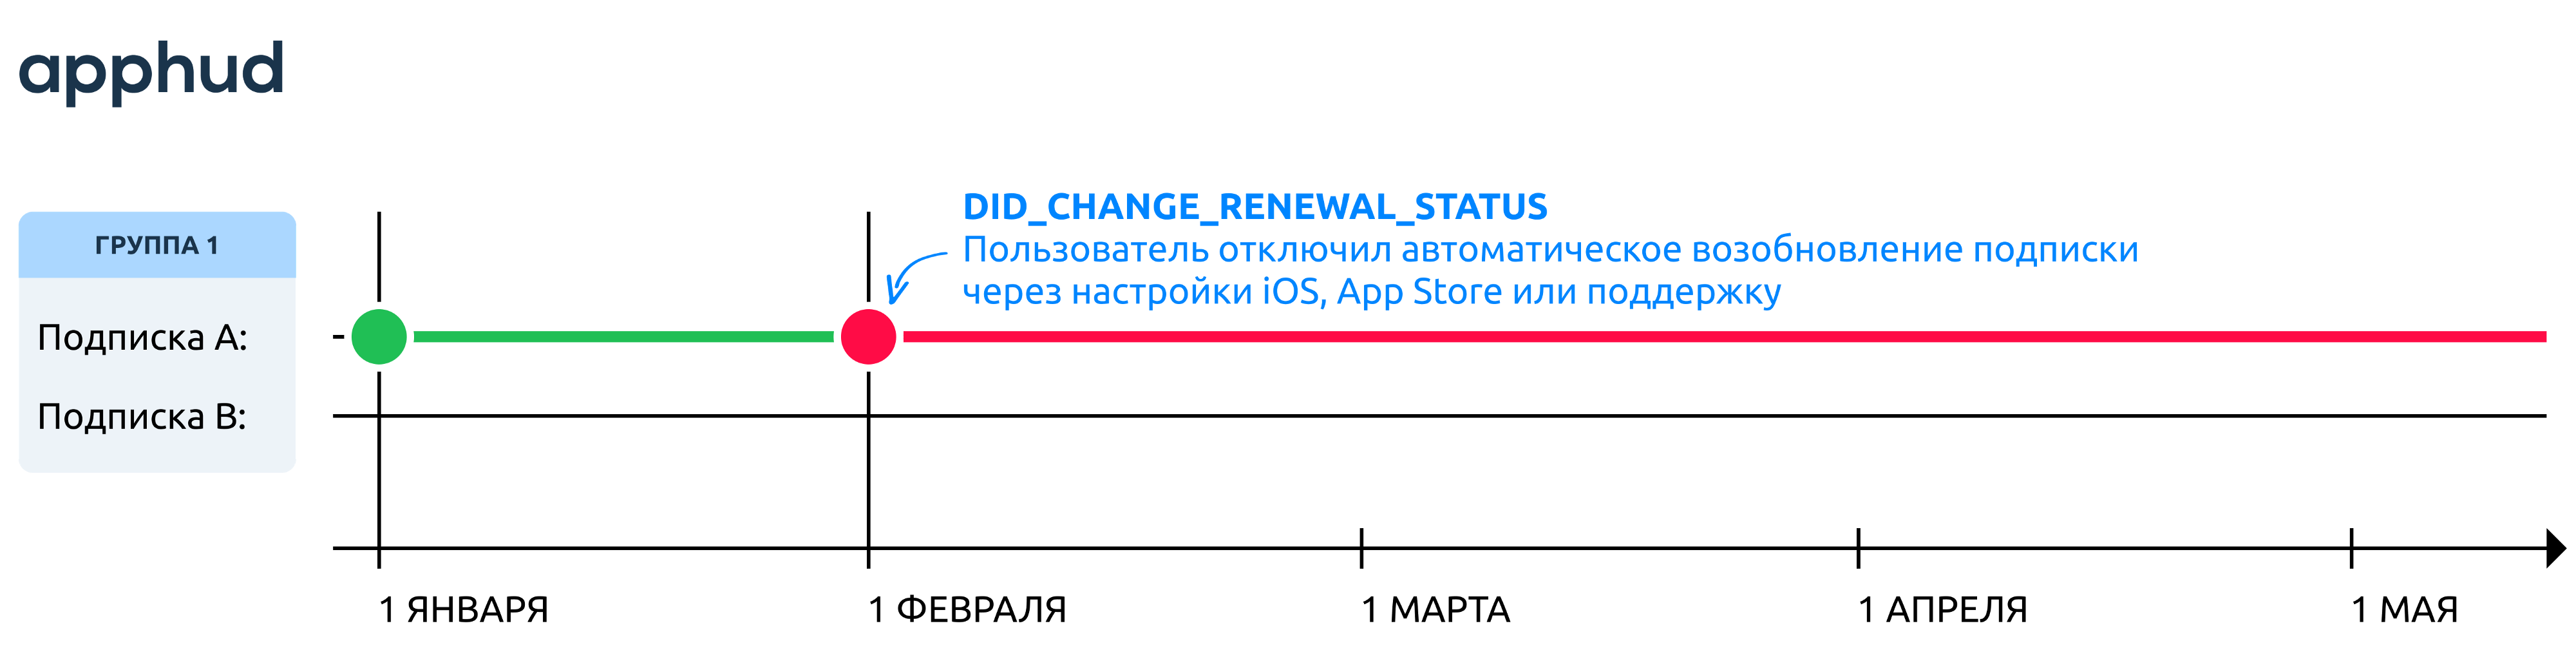 Событие DID_CHANGE_RENEWAL_STATUS